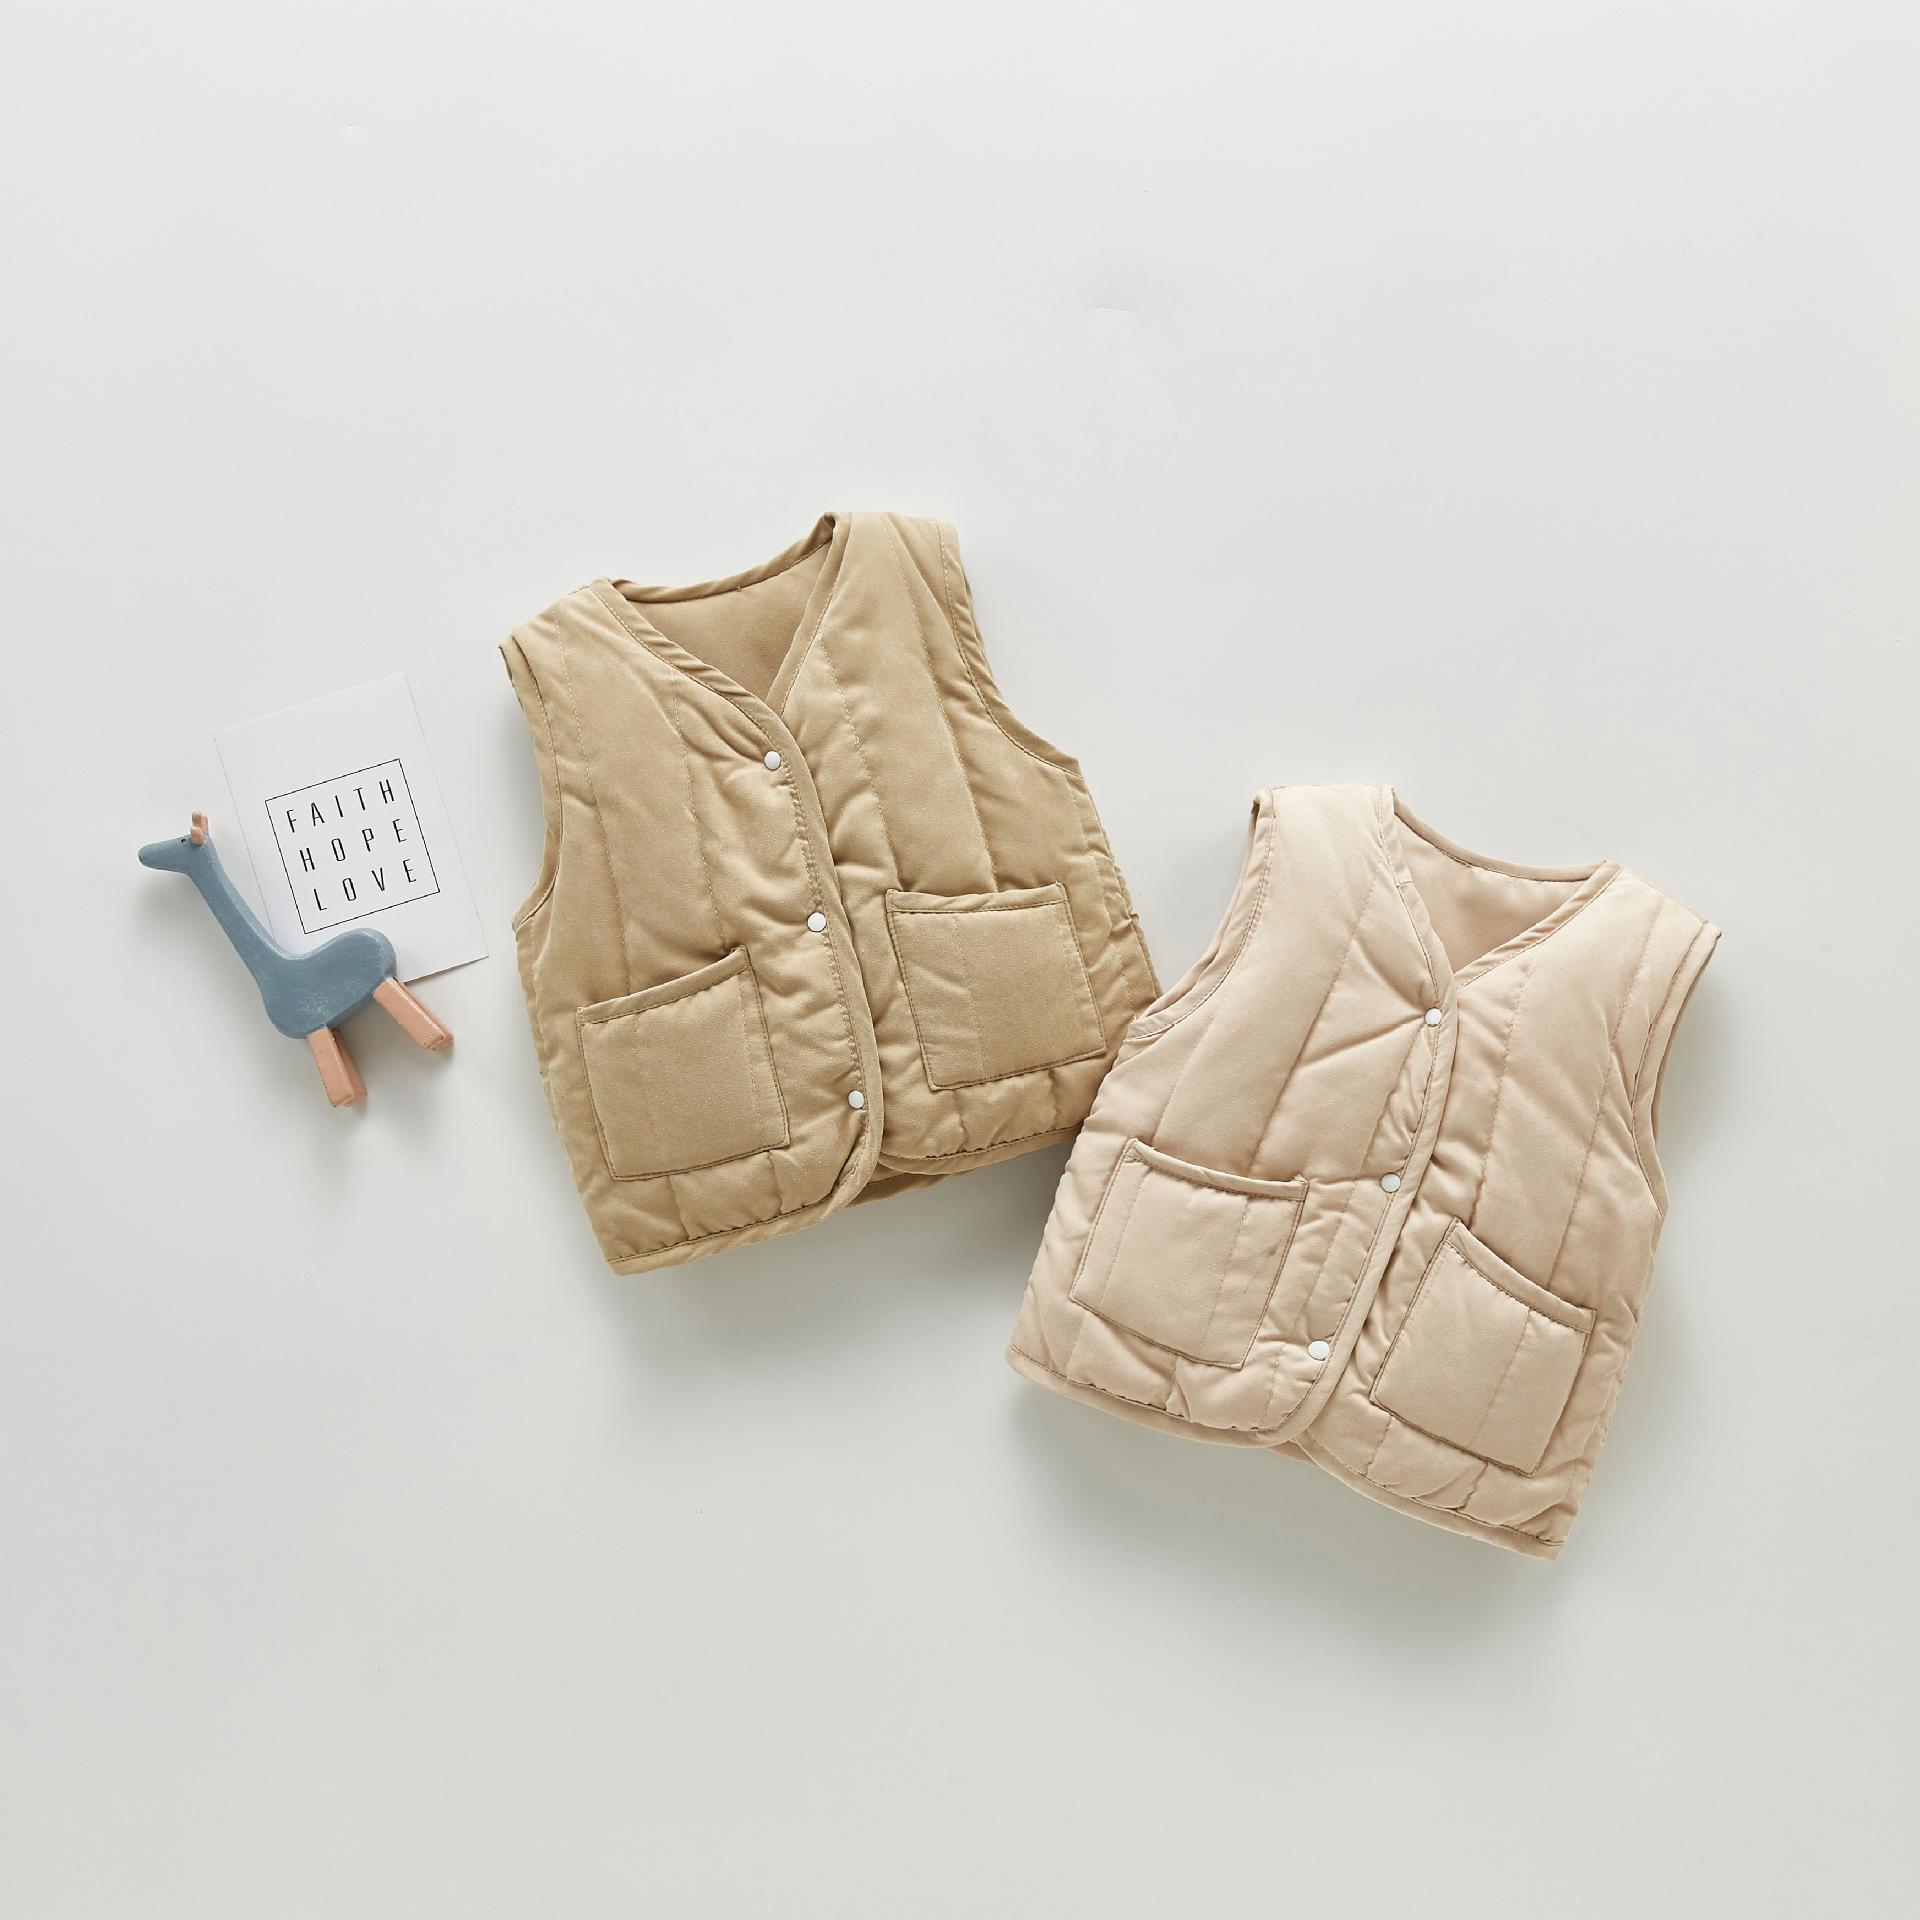 ZHBB INS Korean Baby Boys Girls Jackets Winter Sleeveless Newborn Toddler Coat